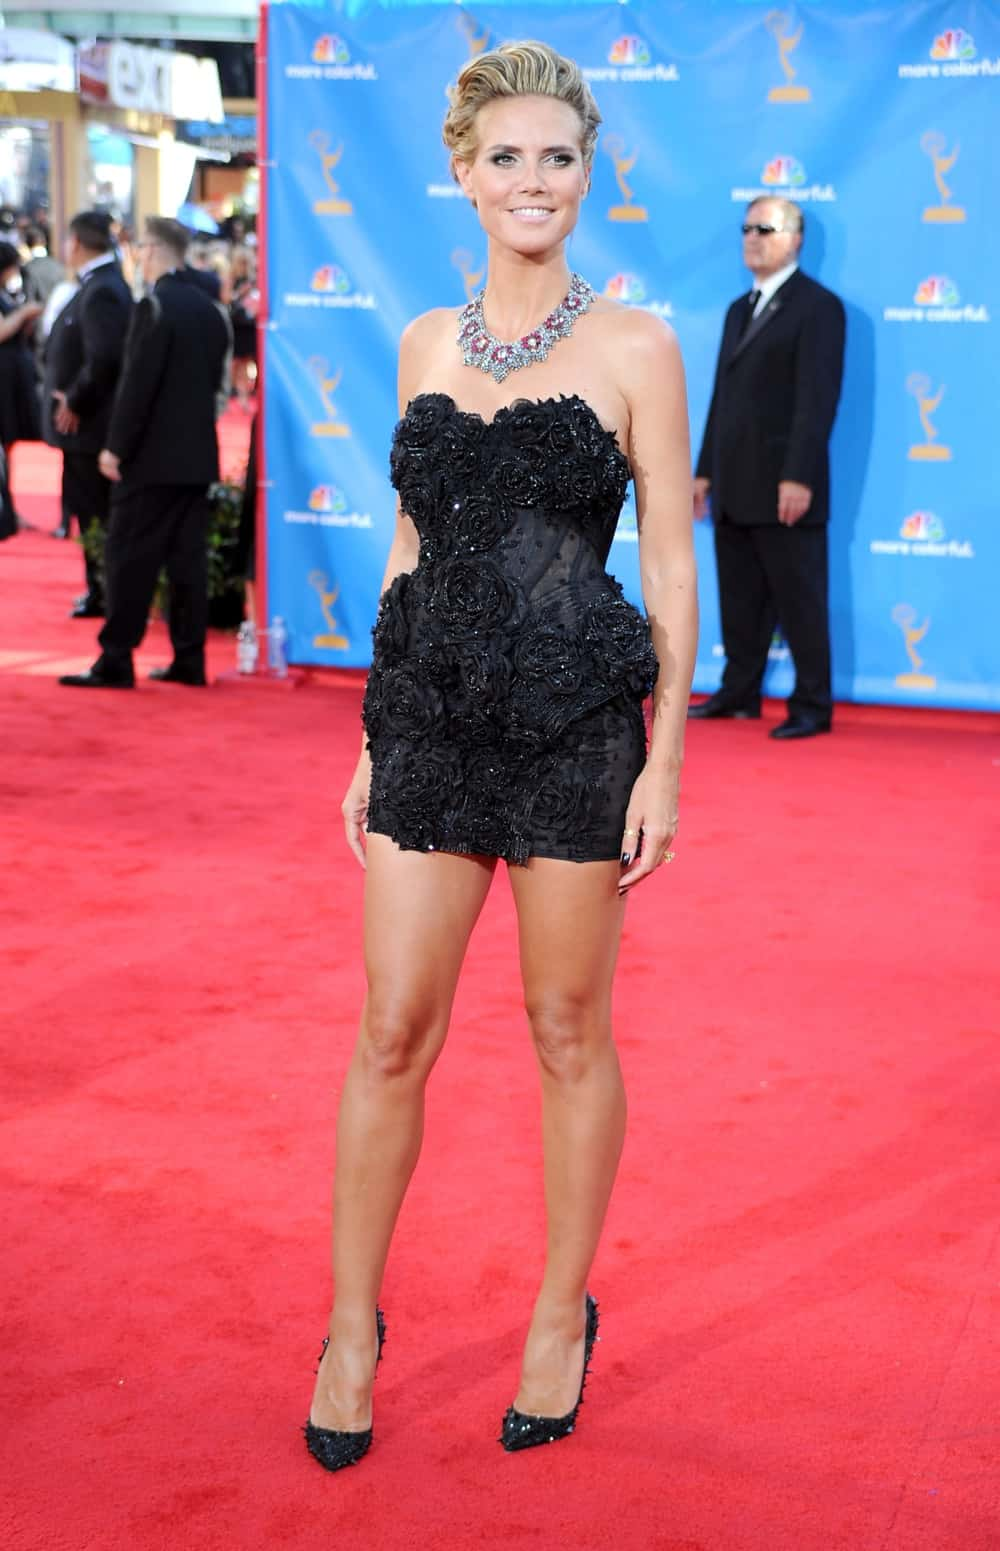 Heidi Klum 62nd Annual Primetime Emmy Awards - Arrivals